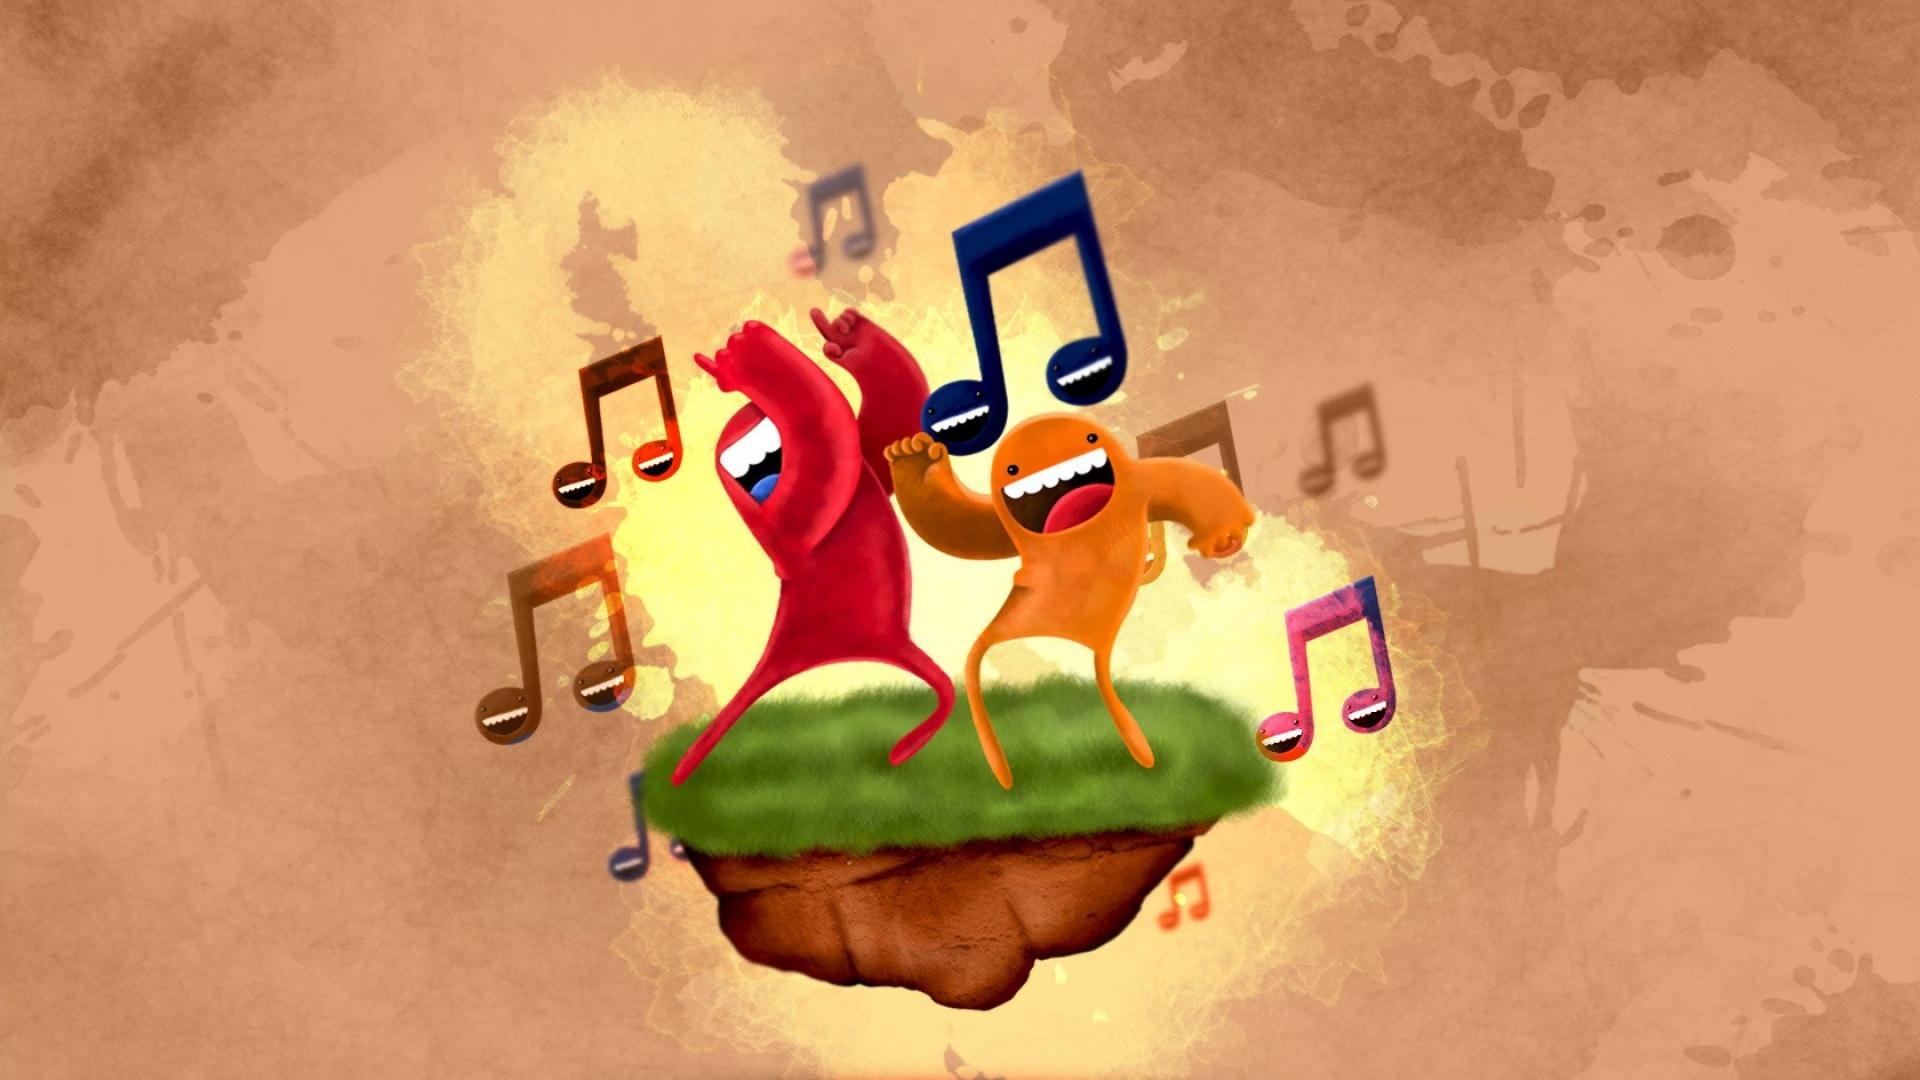 Beautiful Wallpaper Music Bright - dance_music_sheet_music_colorful_grass_island_53782_1920x1080  Trends_472182.jpg